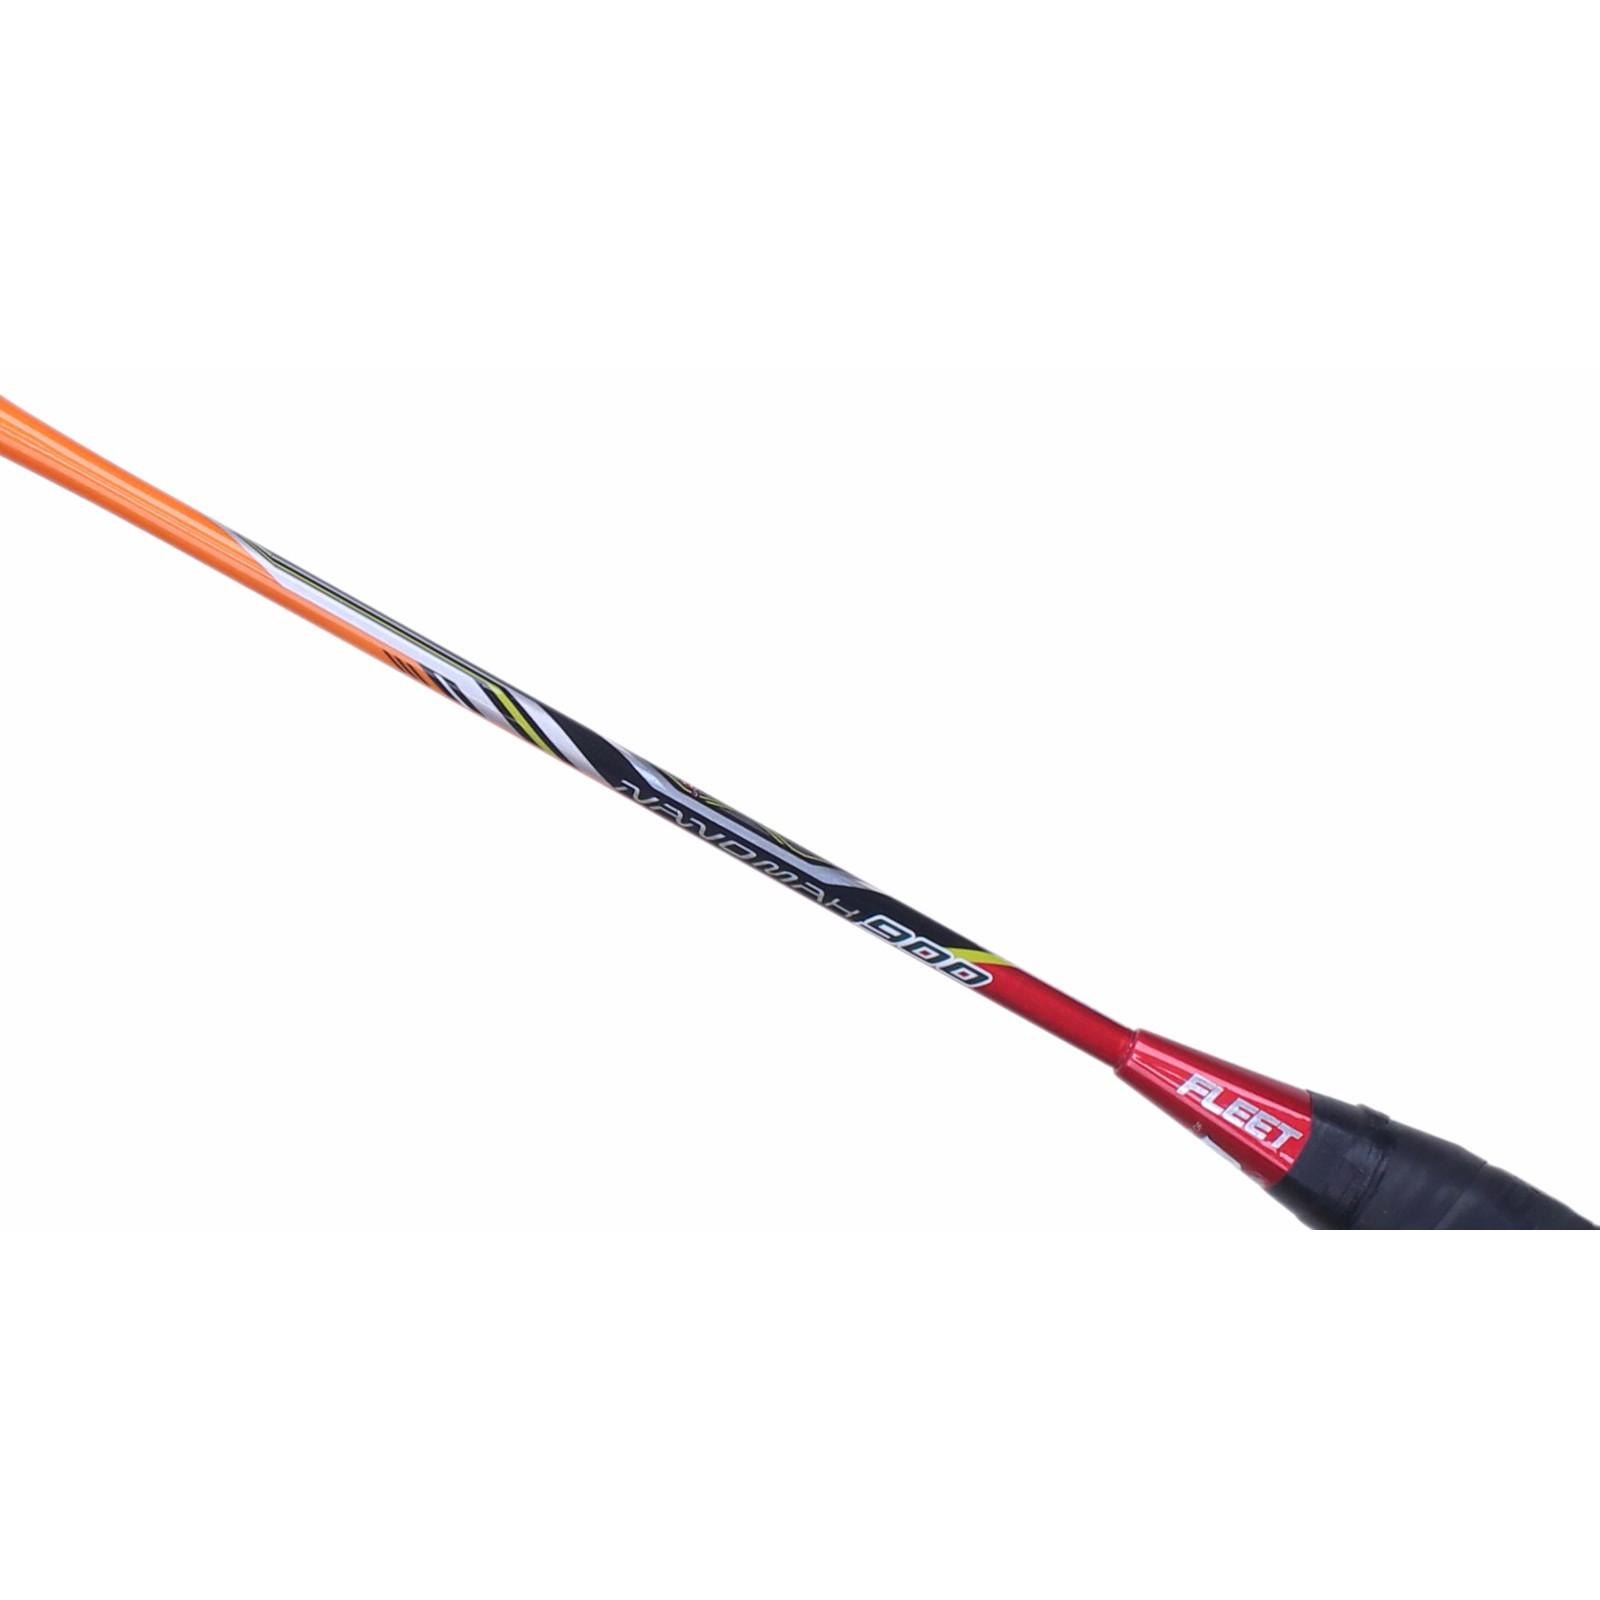 ~Out of stock Fleet NanoMax 900 Orange Badminton Racket (4U)